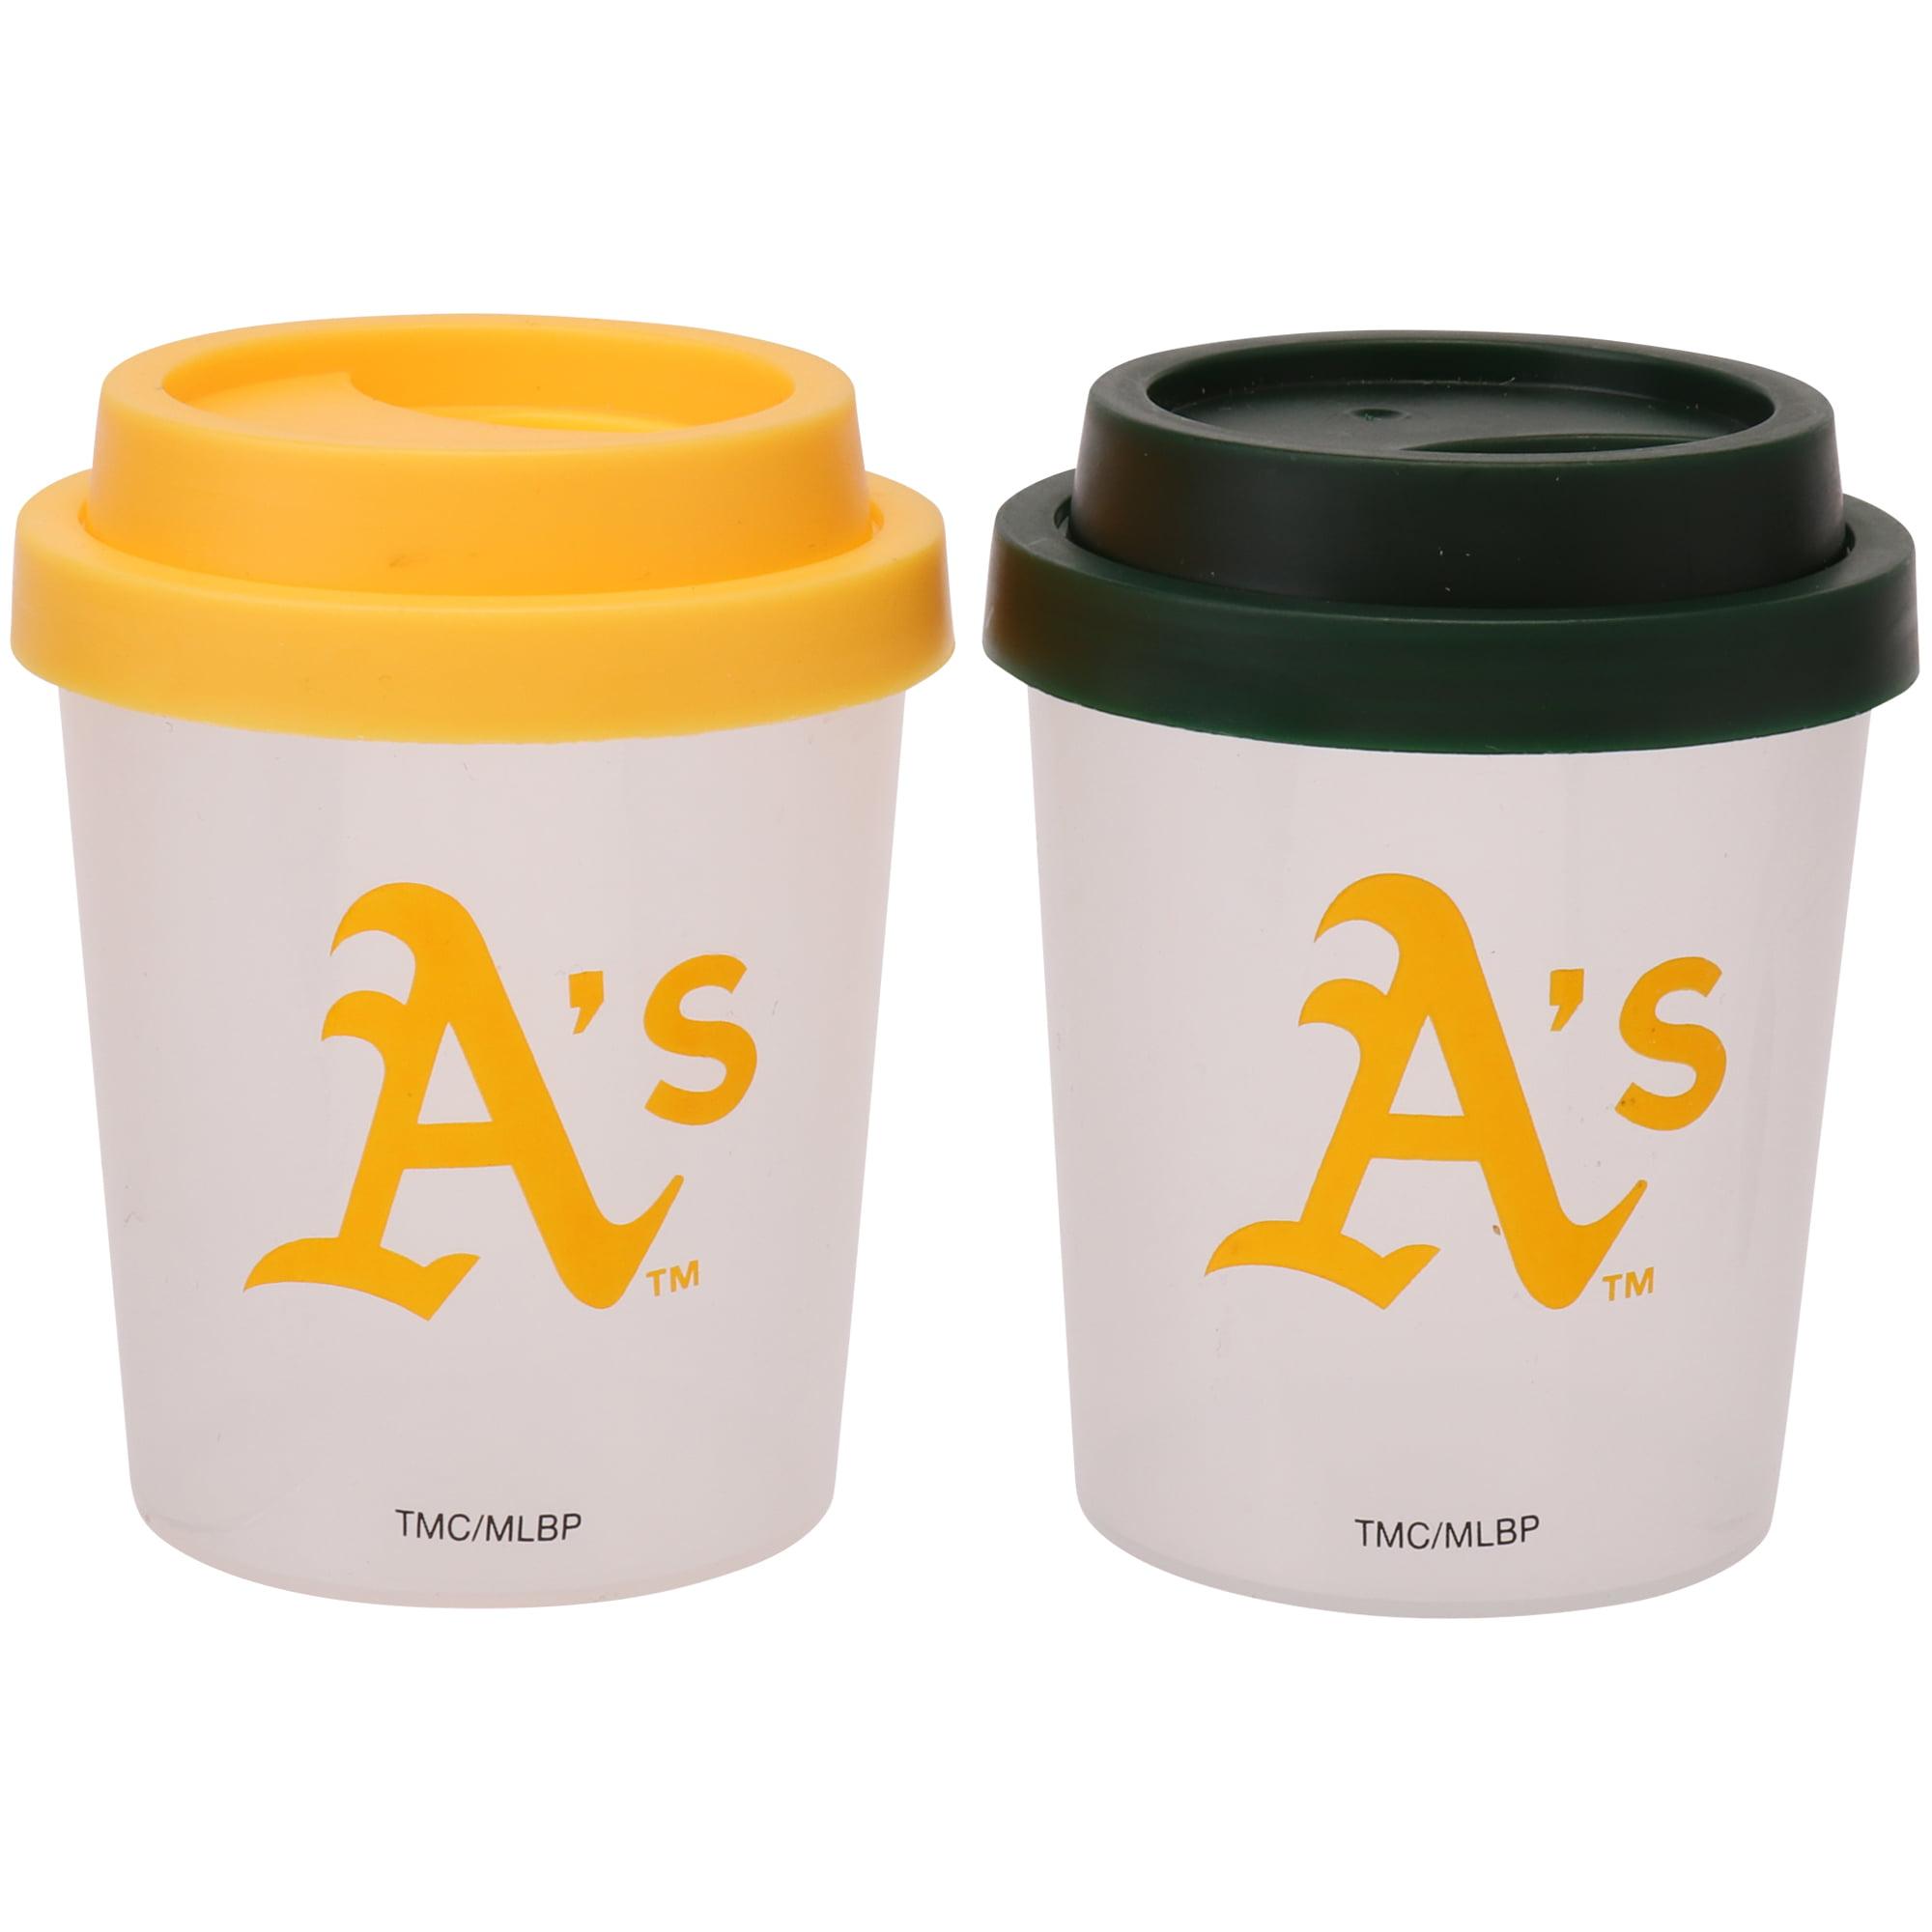 Oakland Athletics Plastic Salt & Pepper Shaker - No Size